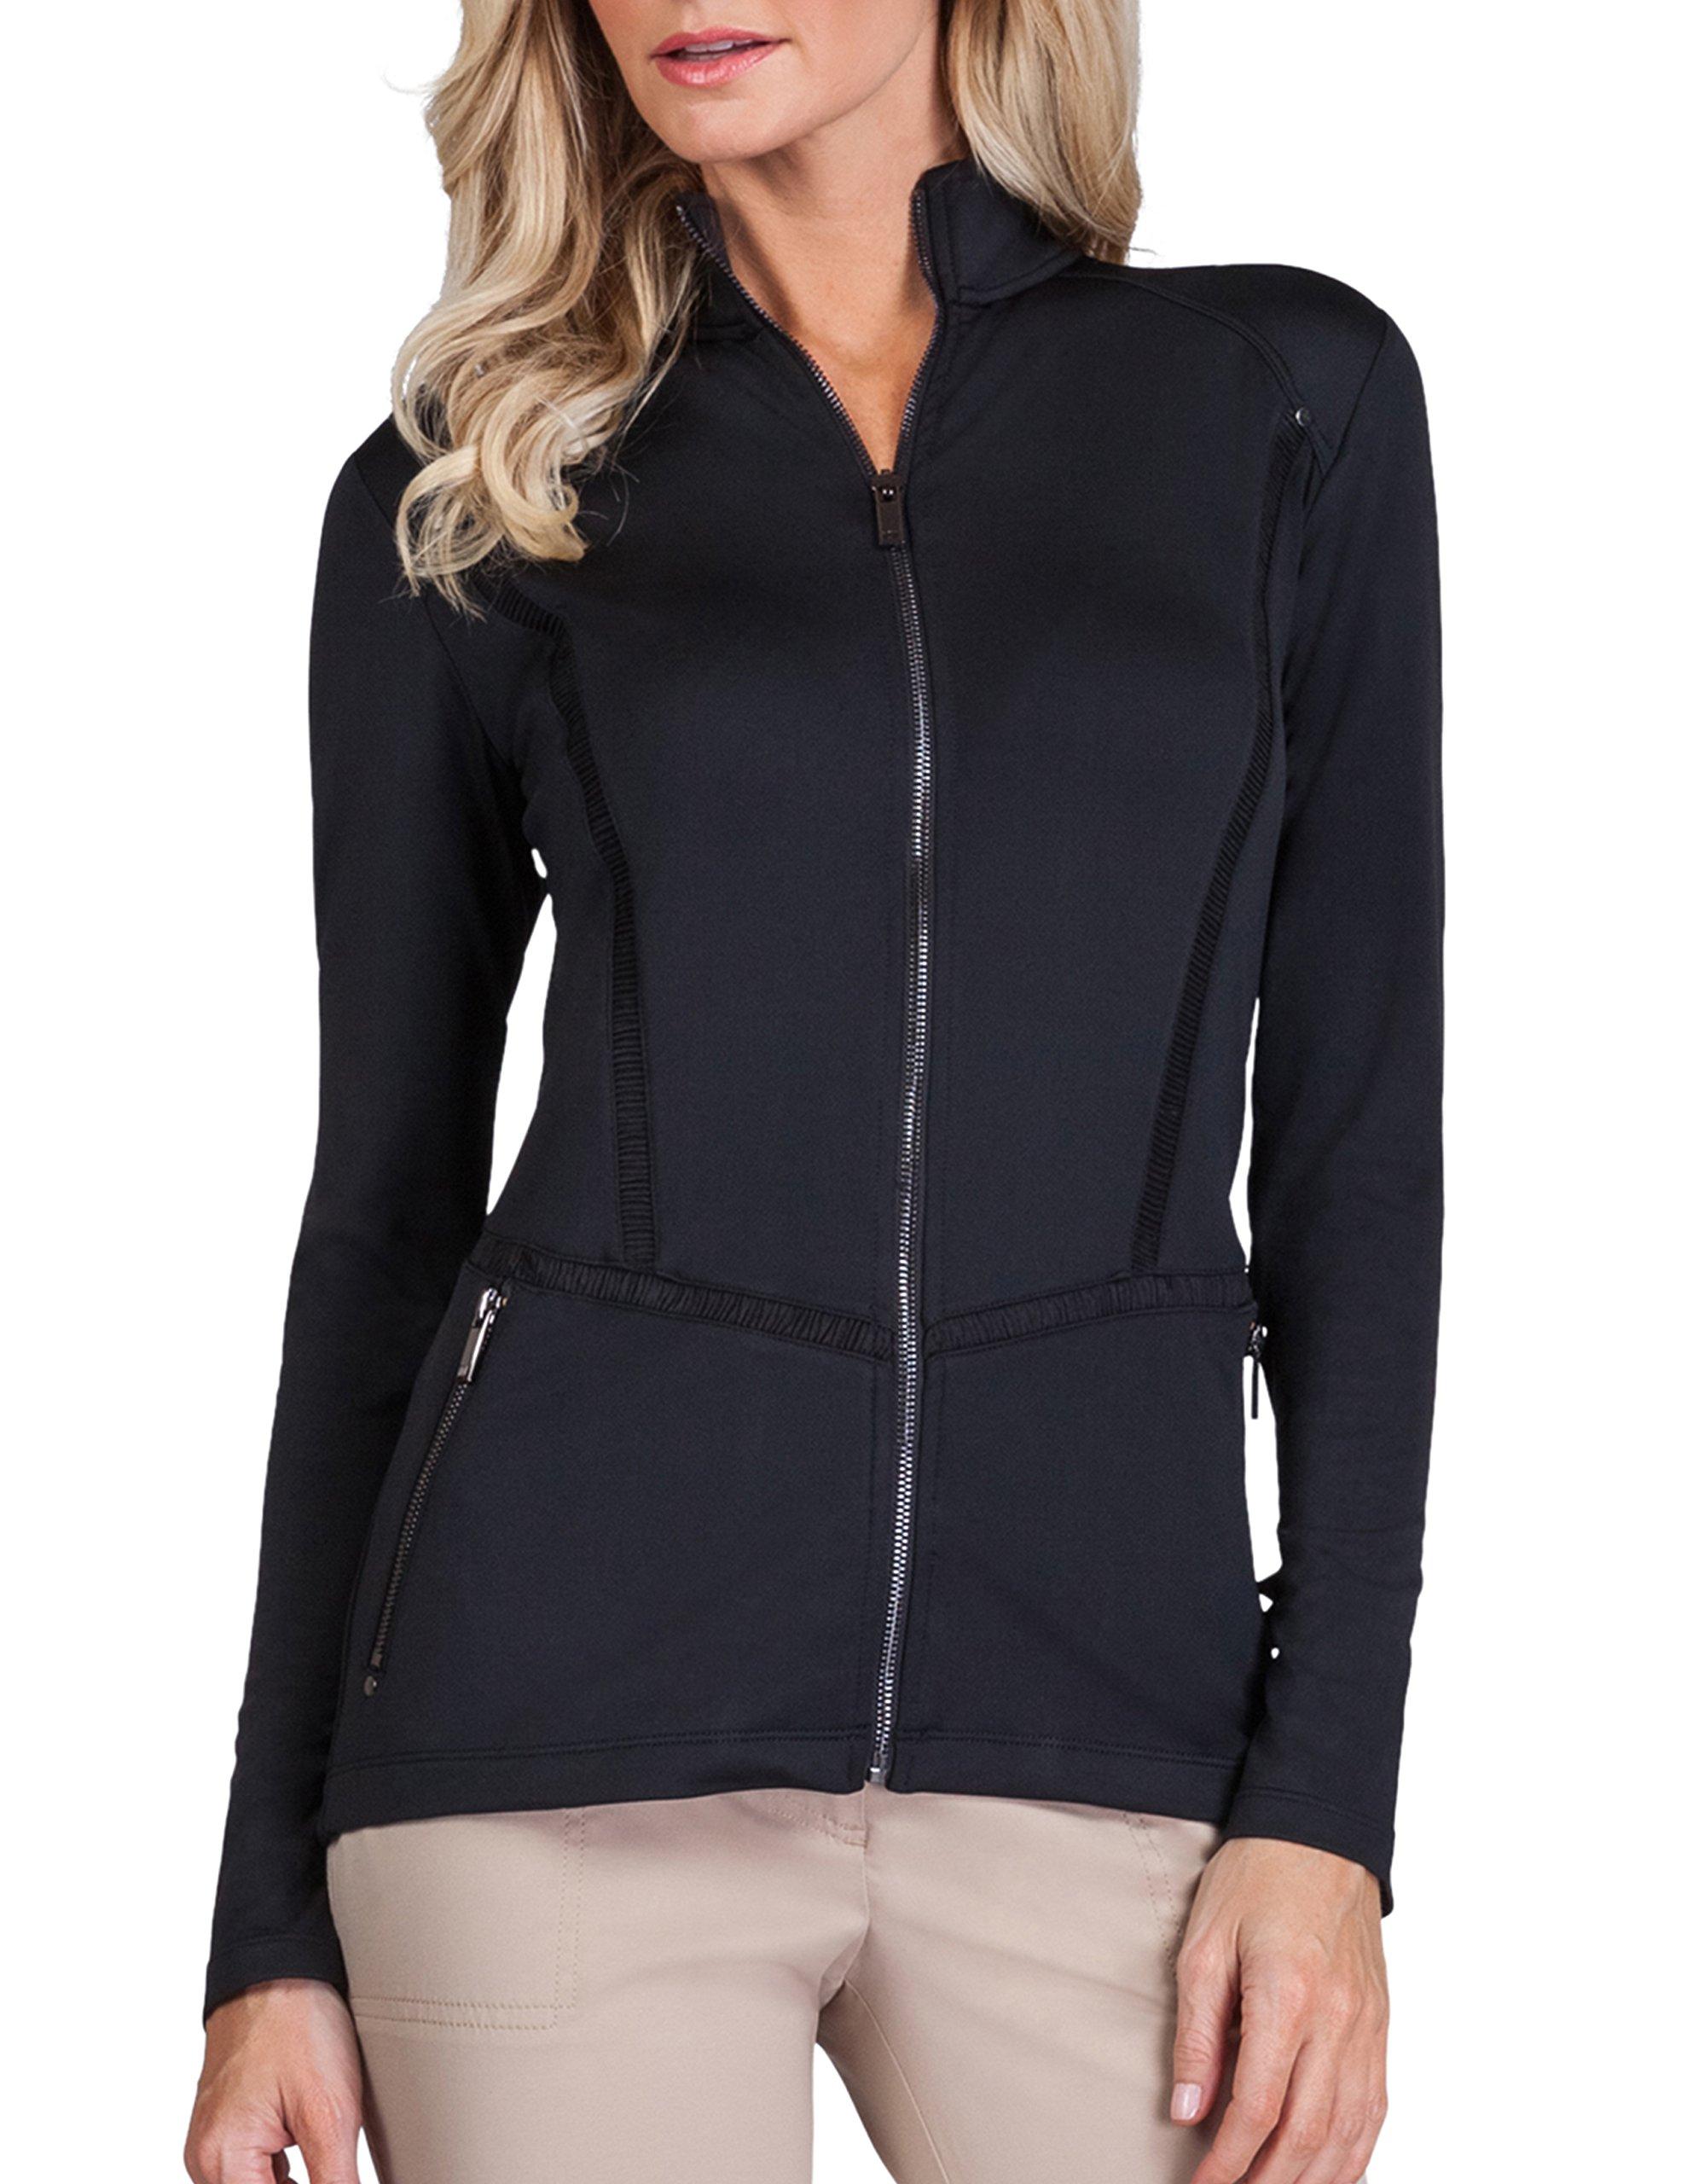 Tail Activewear Golf- Ladies Leilani Jacket